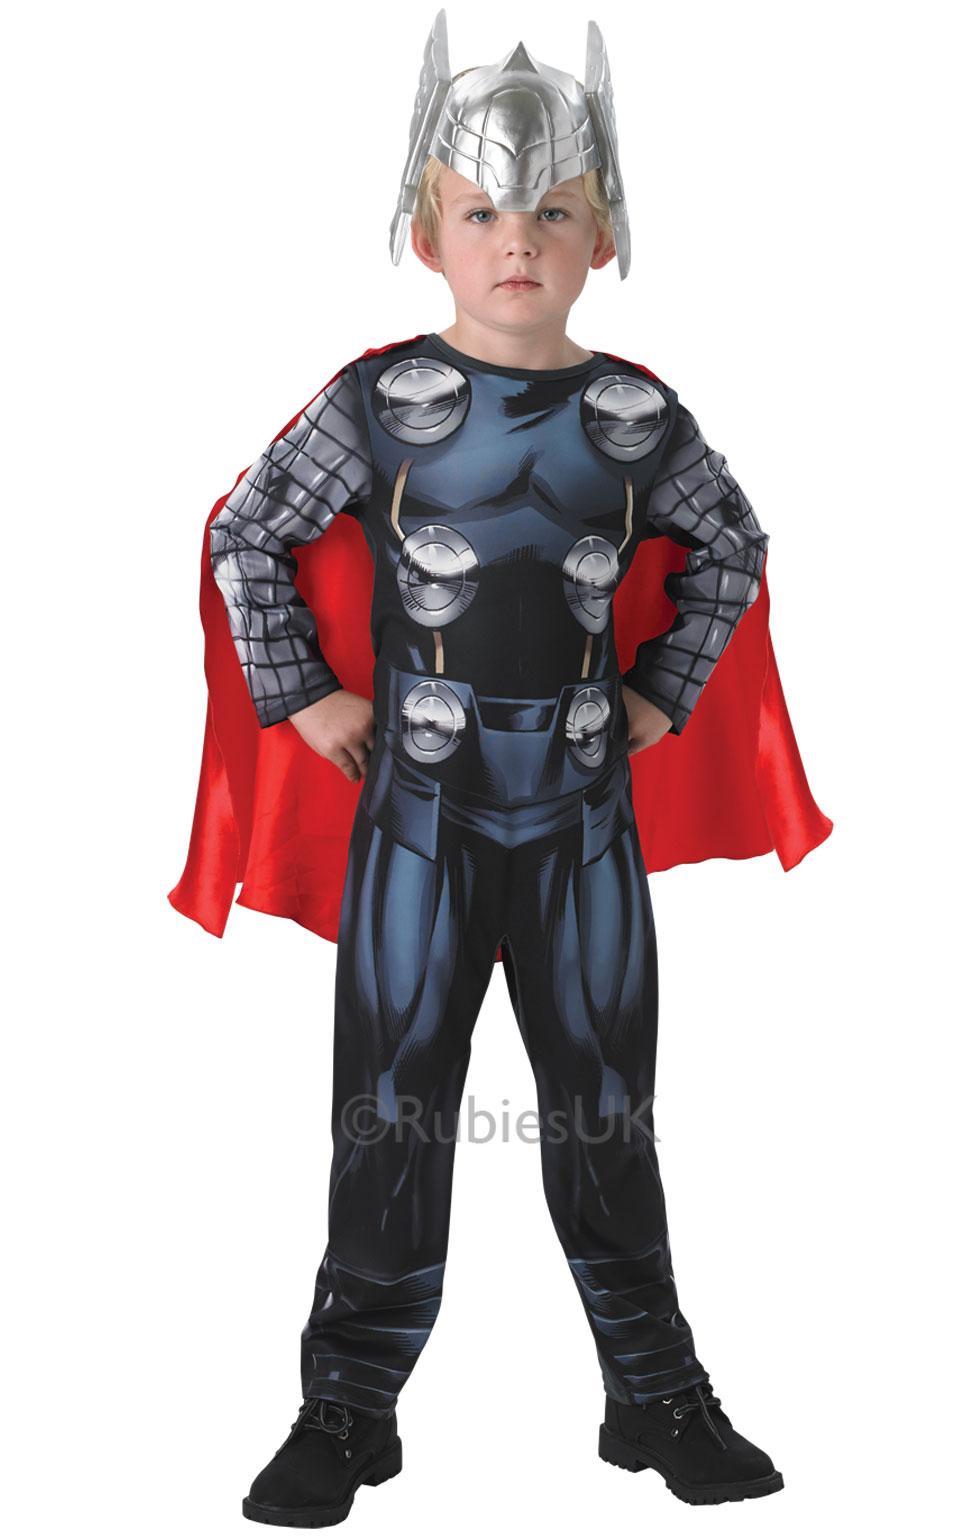 Marvel Avengers Assemble Thor Boys Fancy Dress Up Classic Costume u0026 Helmet  sc 1 st  Wonderland Party & SALE! Marvel Avengers Assemble Thor Boys Fancy Dress Up Classic ...